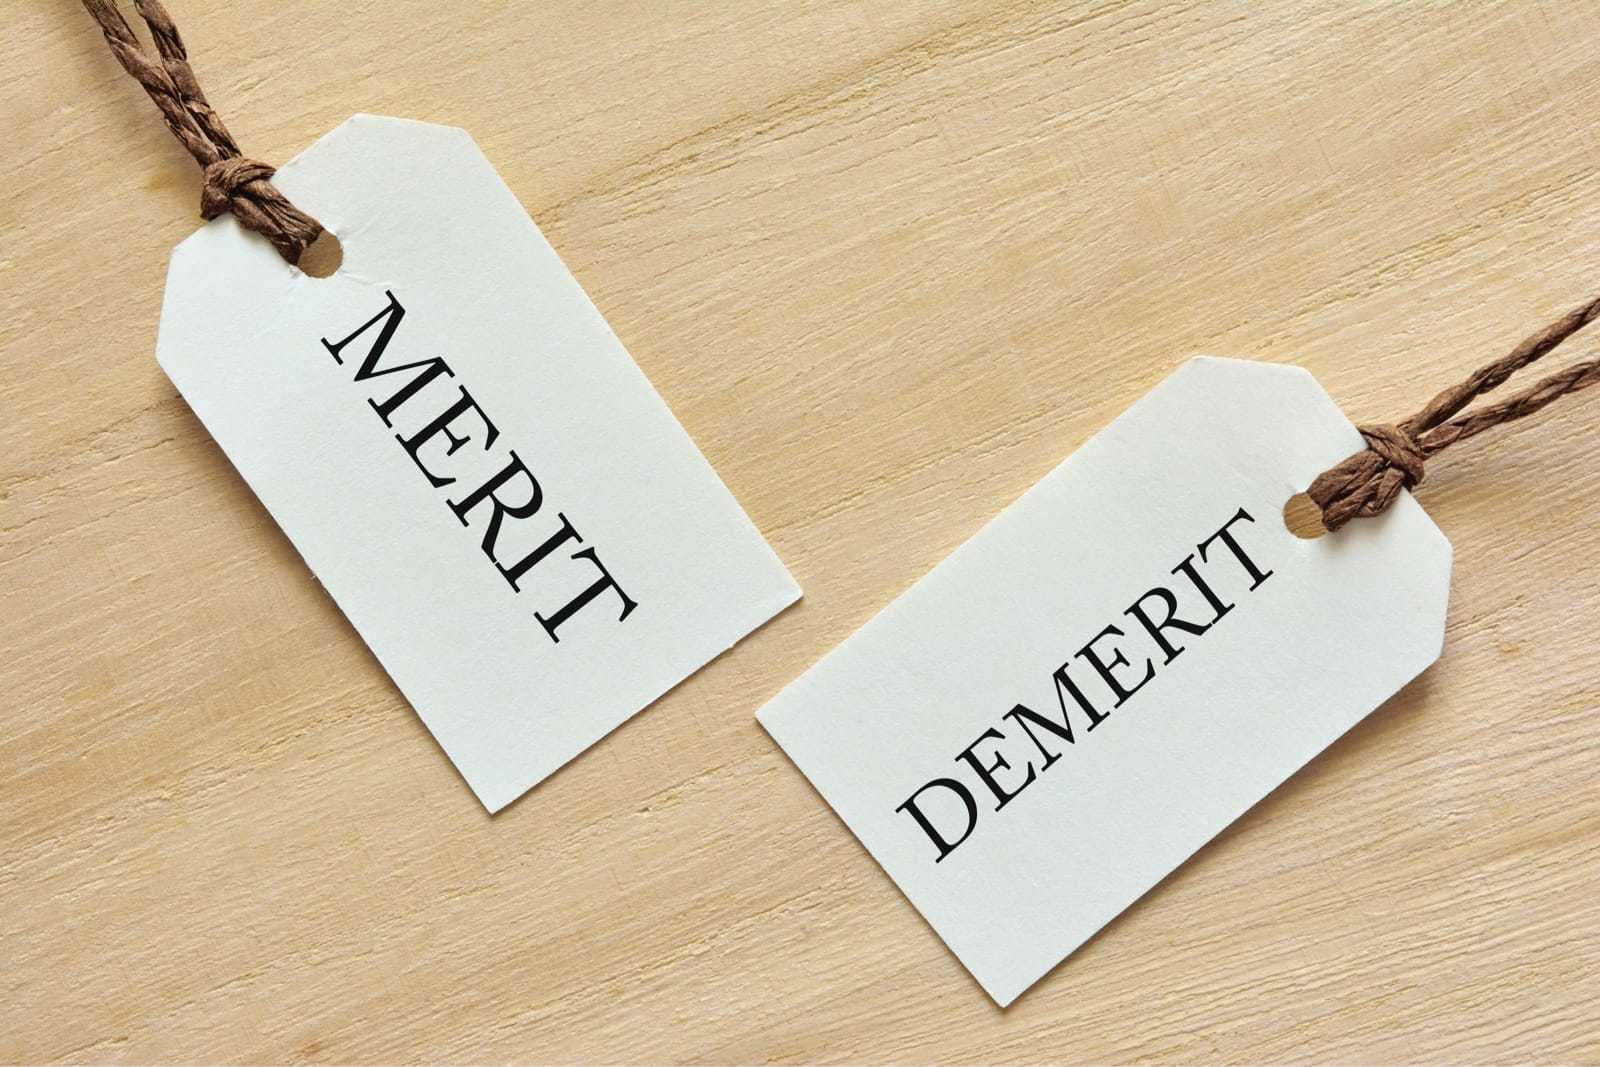 「Merit」「Demerit」と書かれたタグ